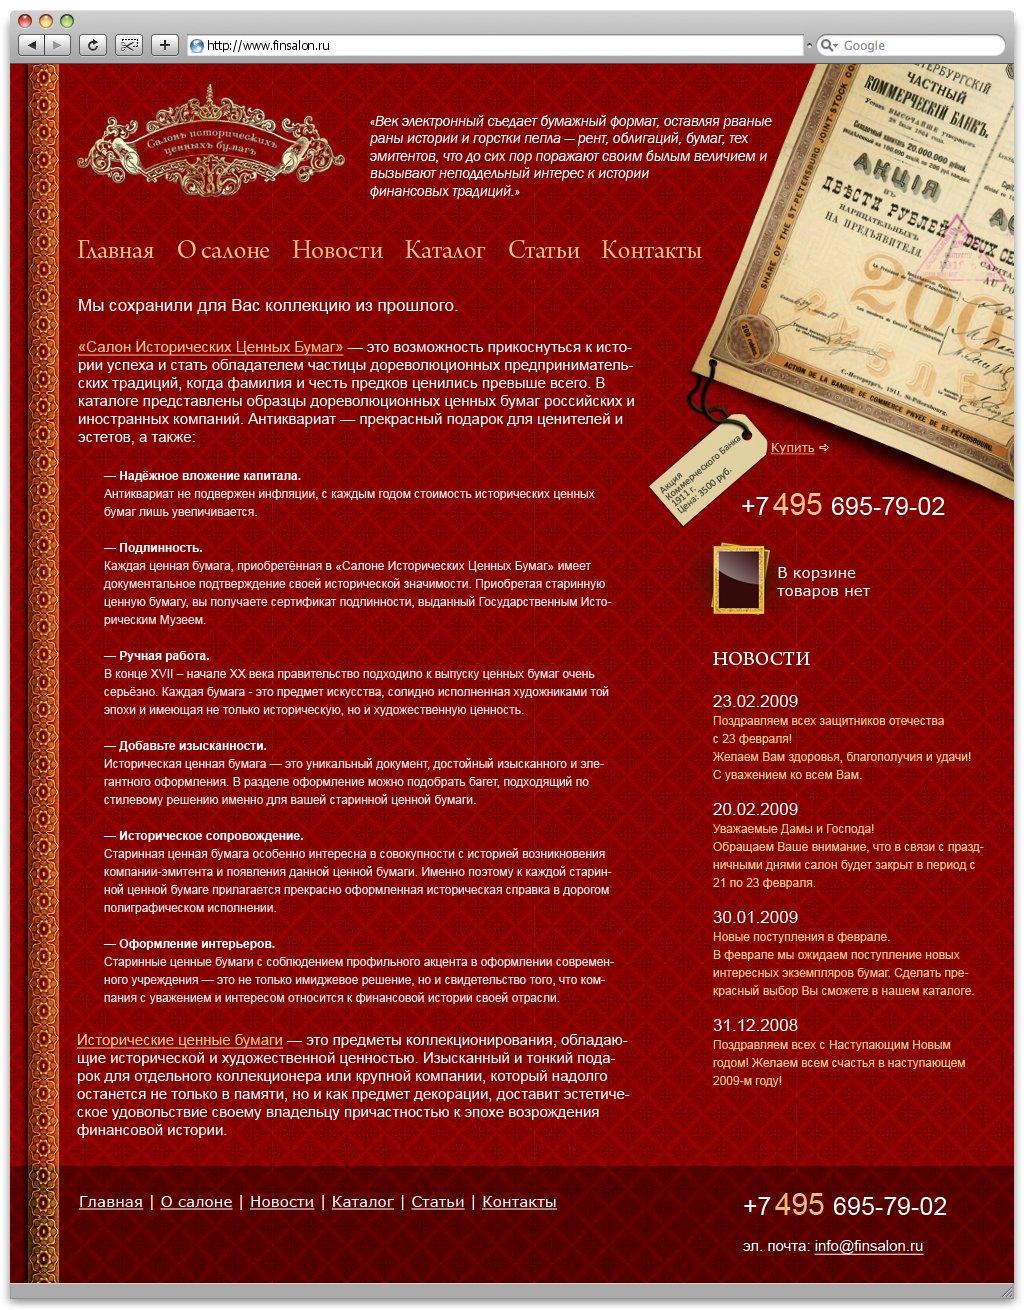 Дизайн сайта старинных ценных бумаг